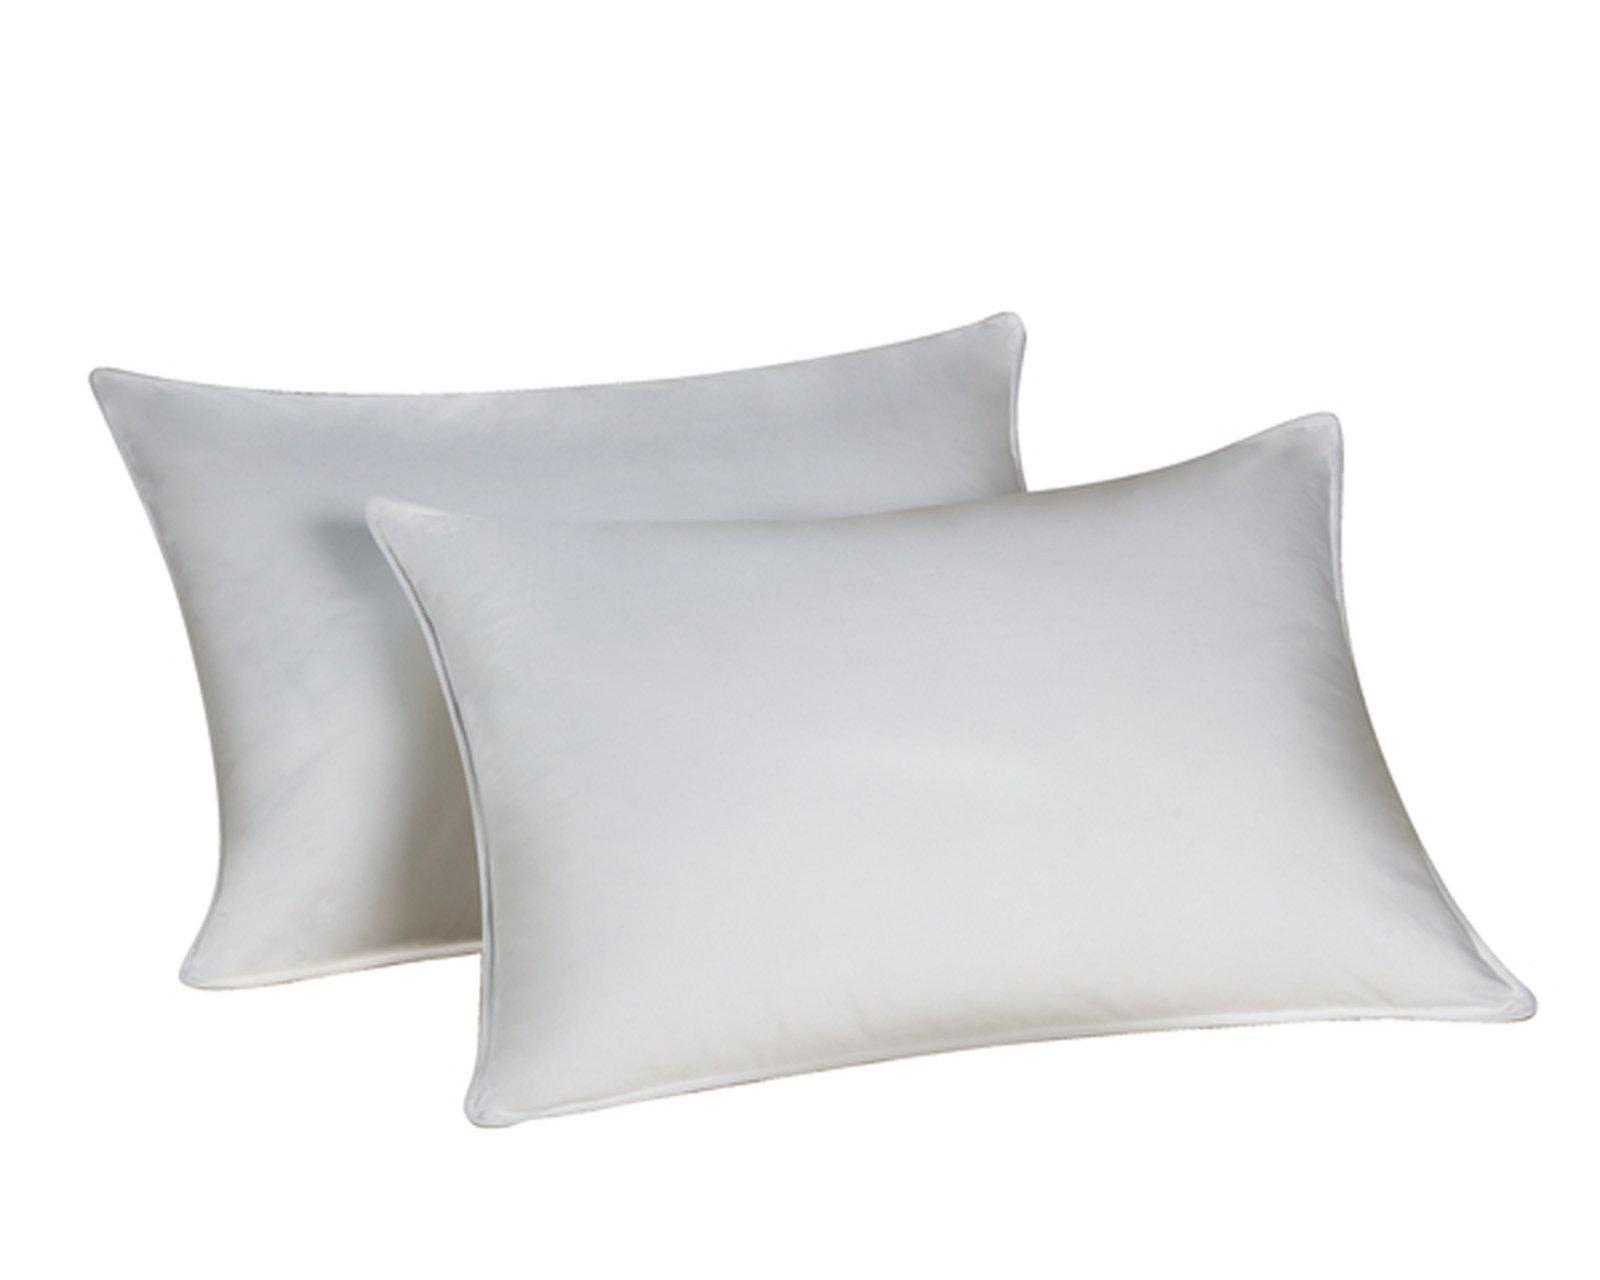 Down Dreams Classic Queen Pillow Set of 2